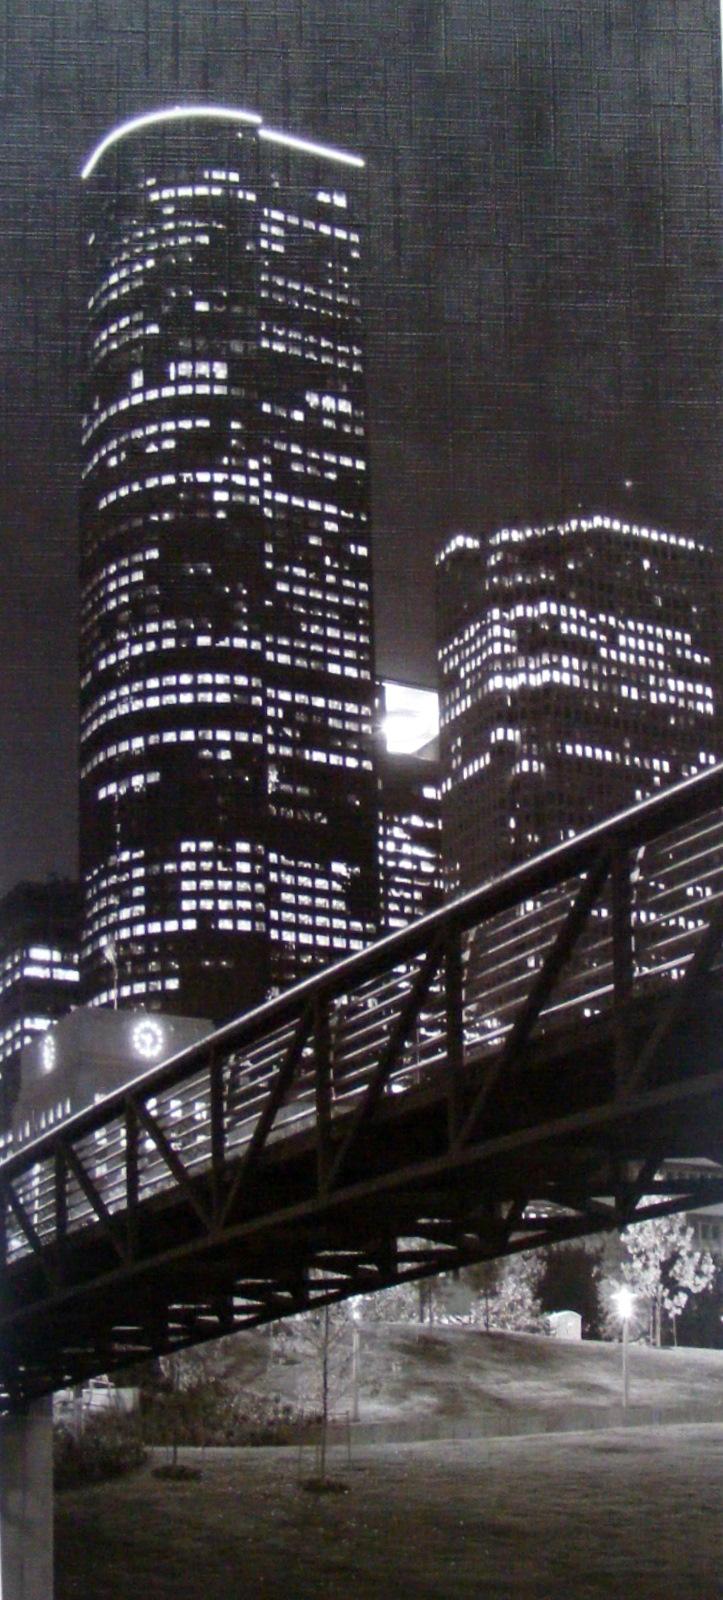 Černobílý obraz mrakodrapů